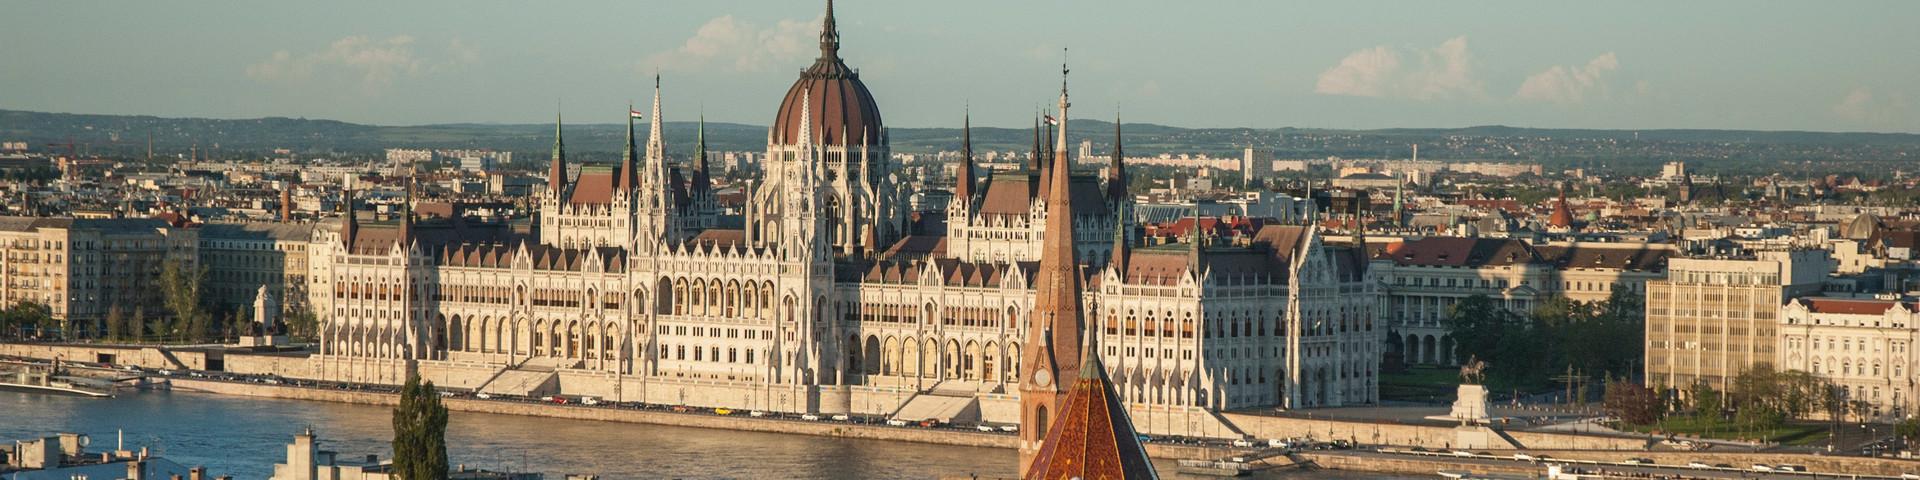 Budapest Parlament © budapestinfo.hu